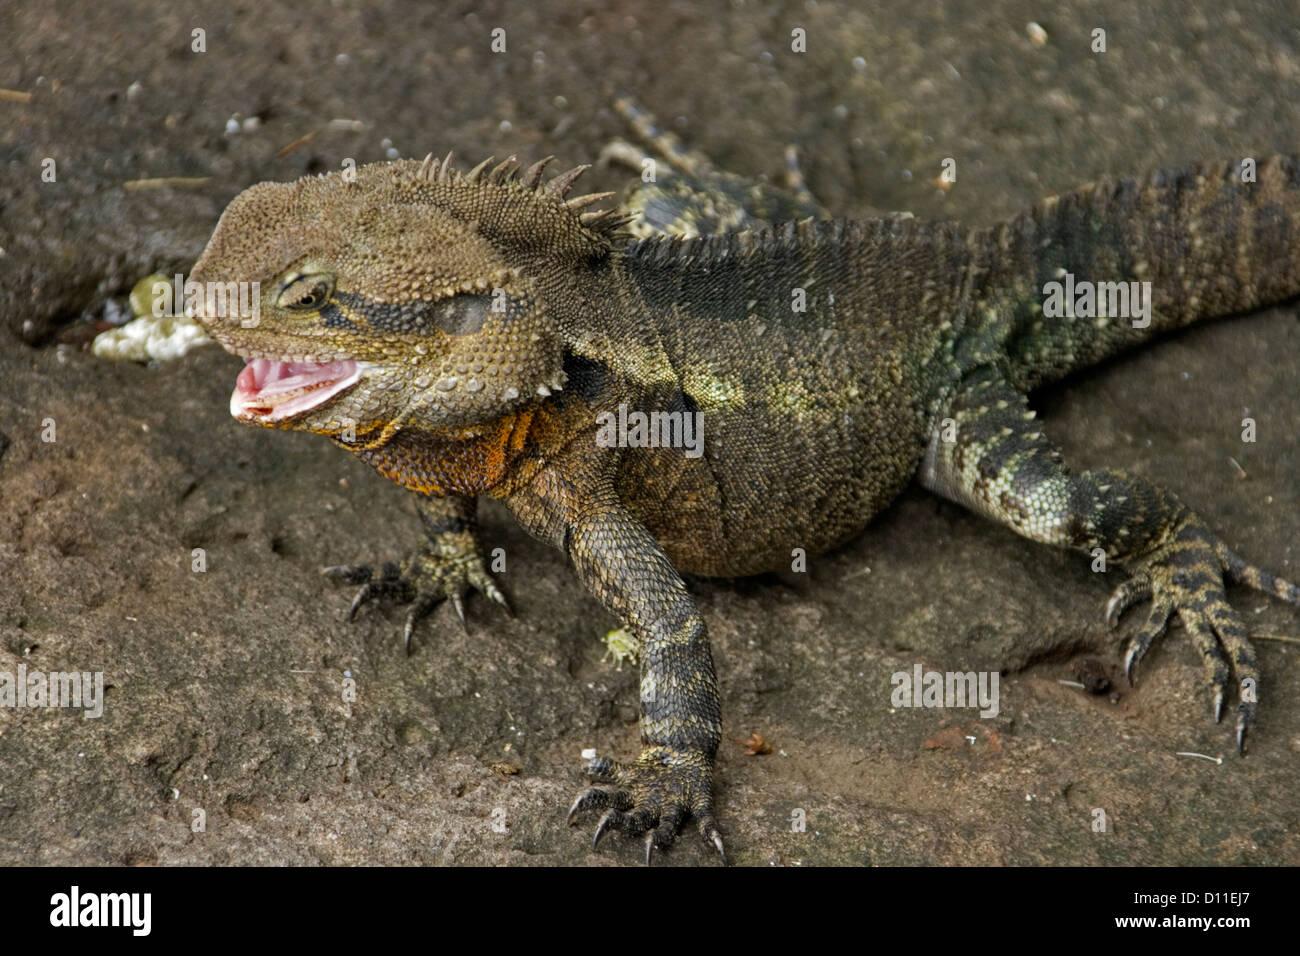 Australian Water Dragon Lizard: Physignathus Lesueurii